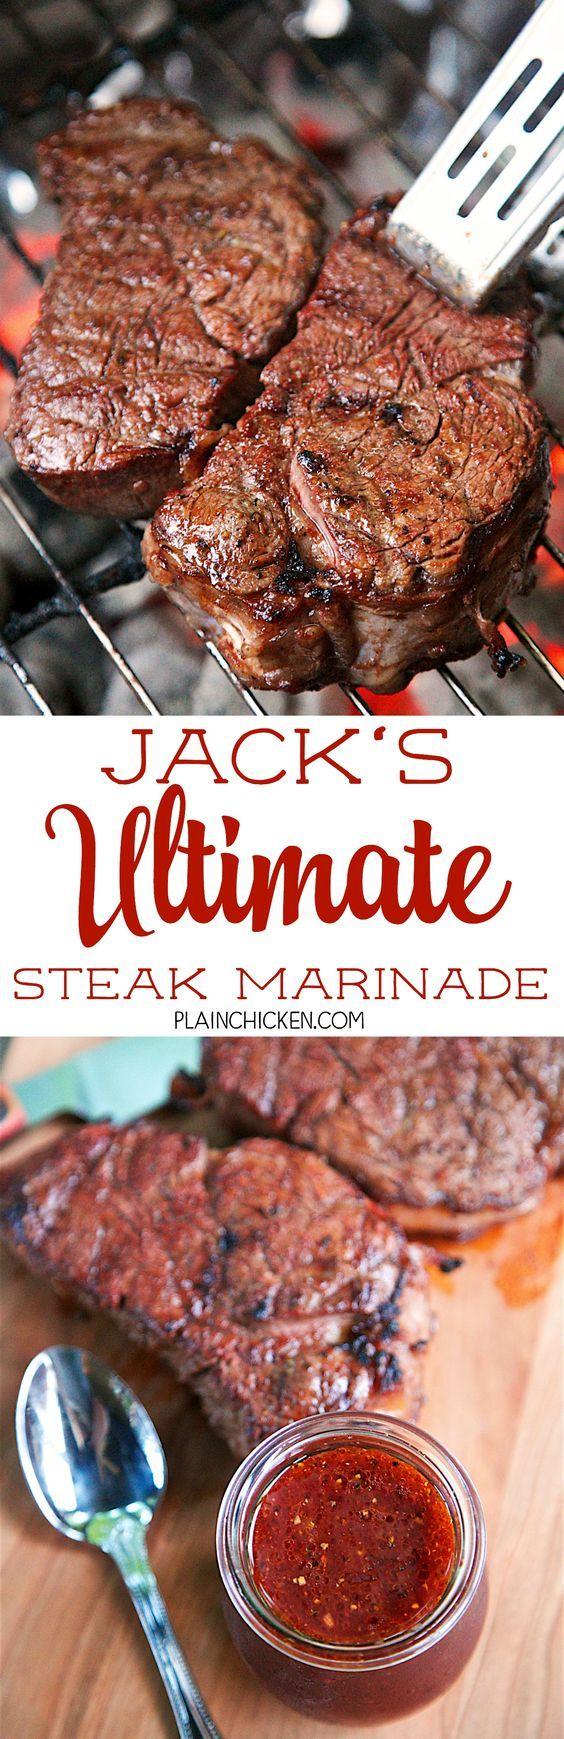 Jack S Ultimate Steak Marinade Steaks Marinated In Red Wine Chili Sauce Red Wine Vinegar Worcestershire Sauc Diy Food Recipes Beef Recipes Marinated Steak